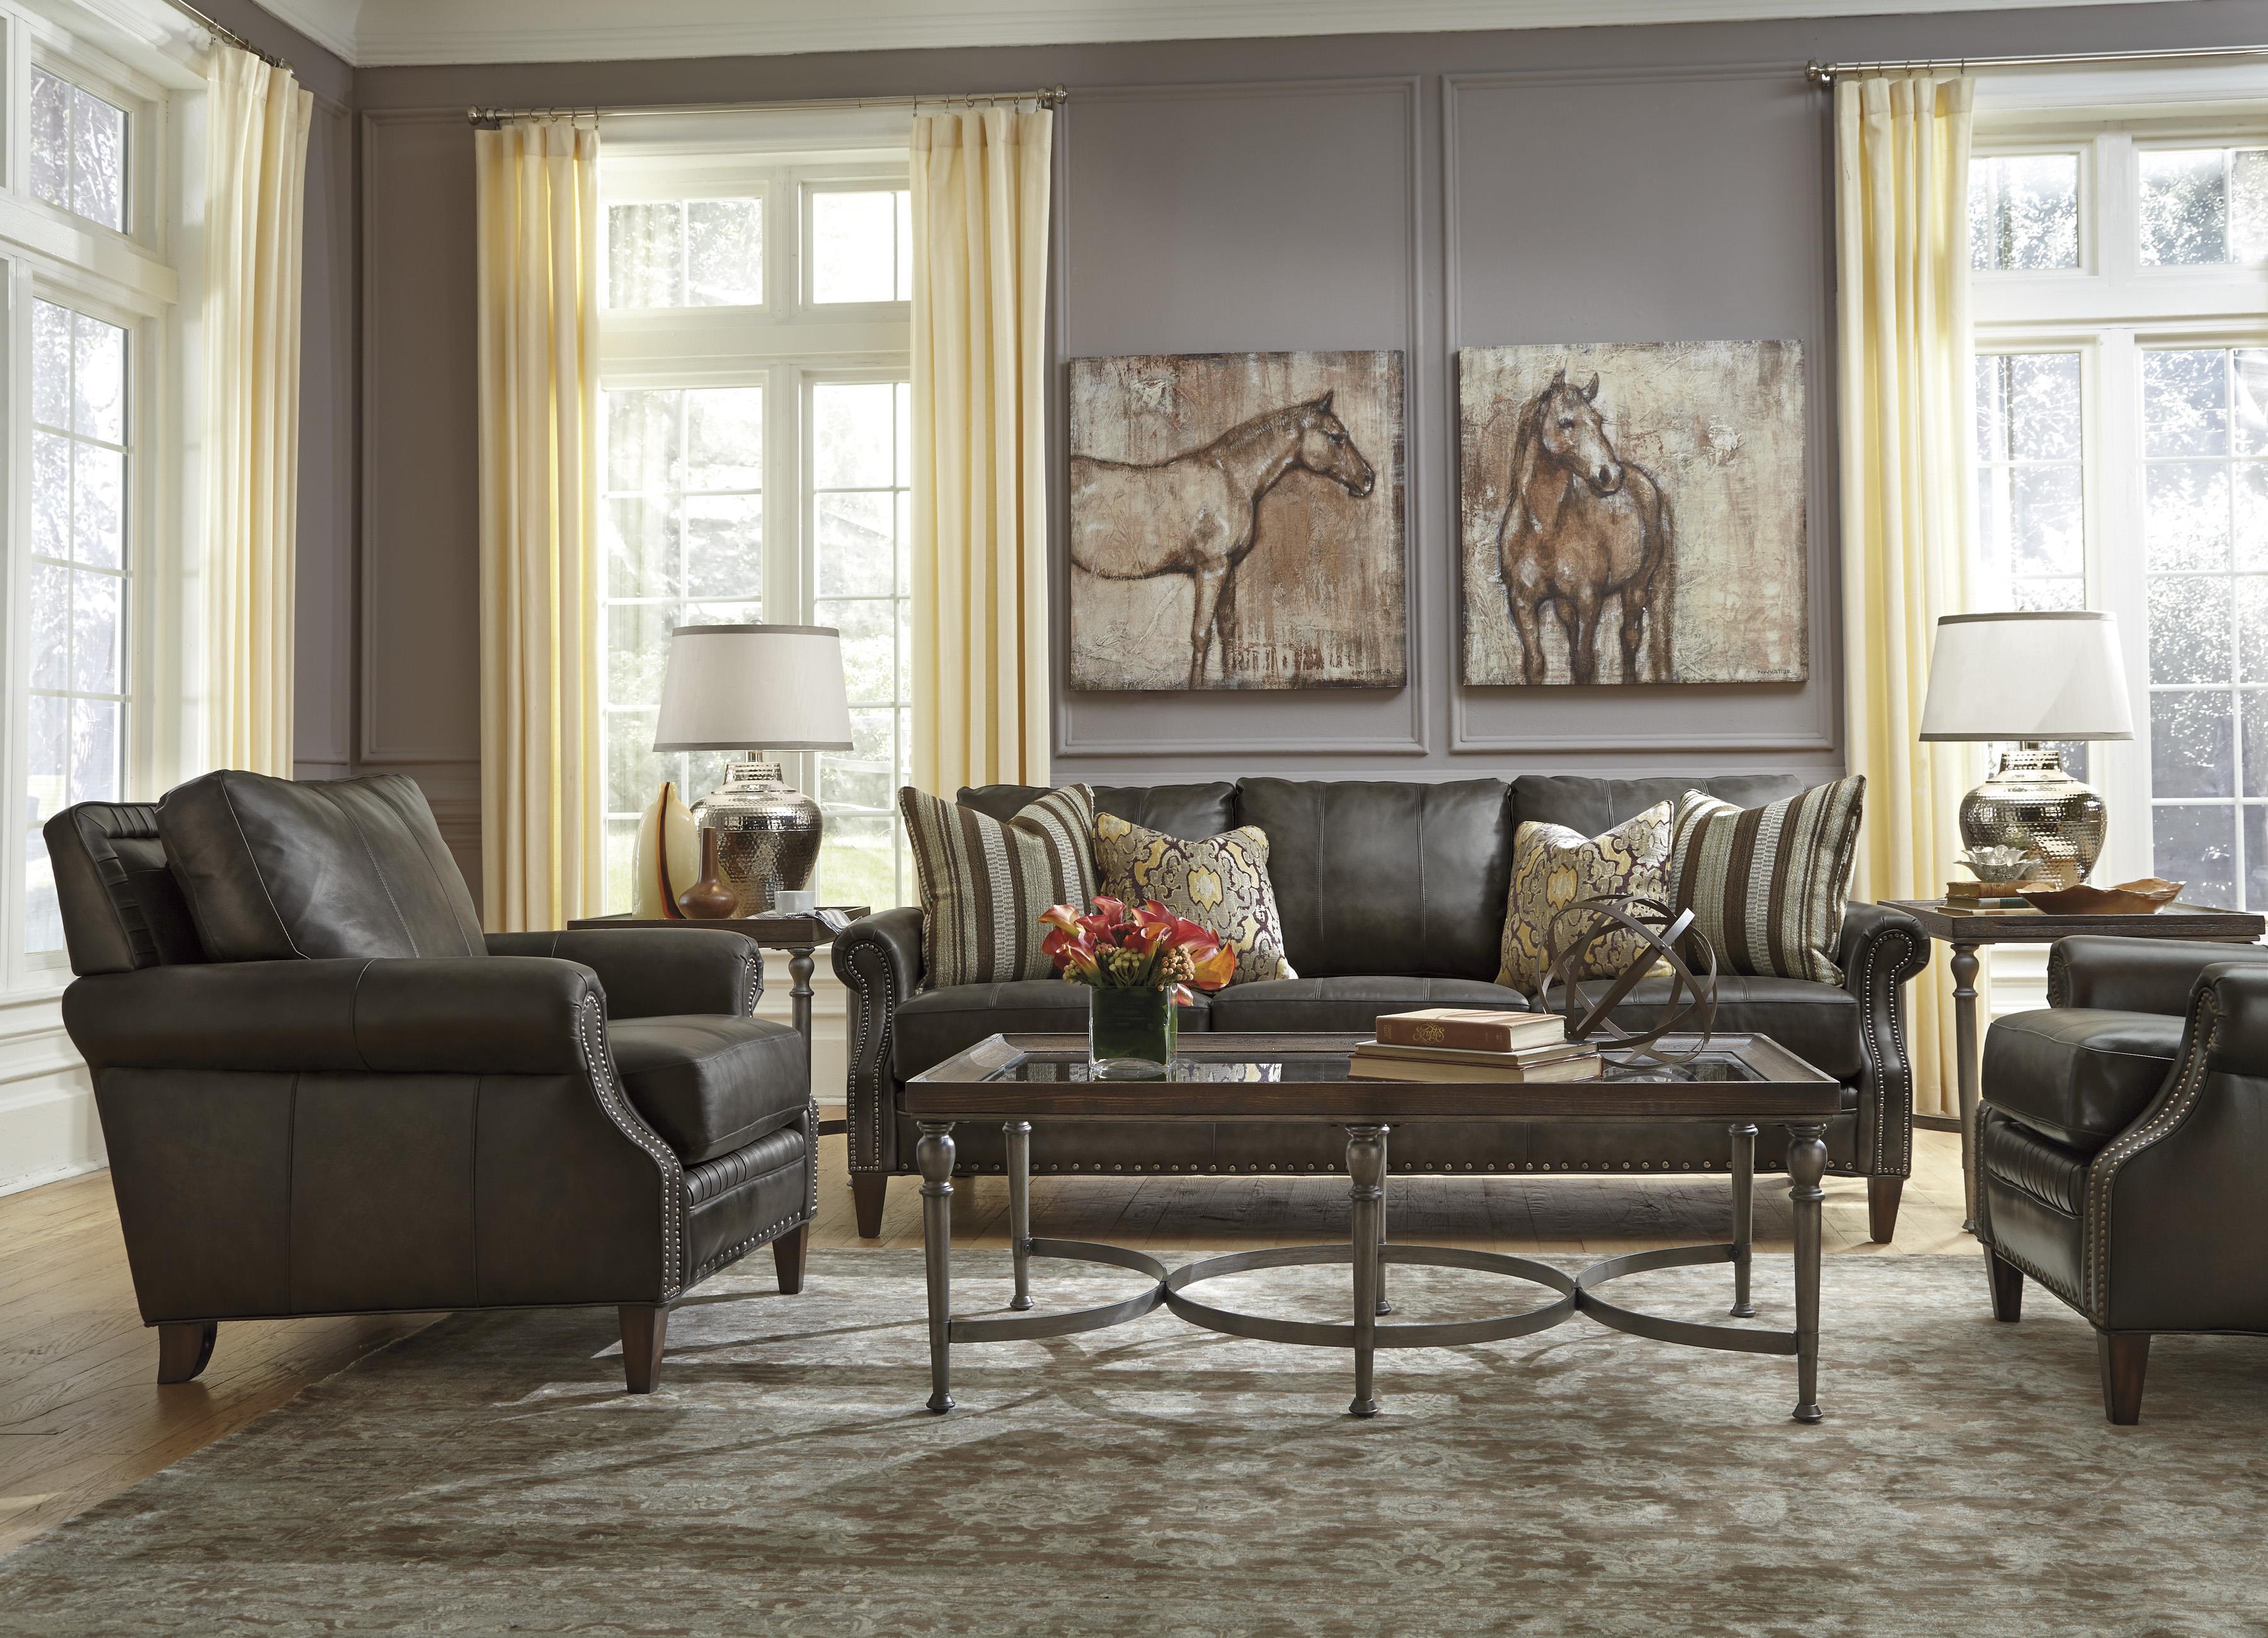 Flexsteel Latitudes-Daltry Stationary Living Room Group - Item Number: 1213 Living Room Group 1